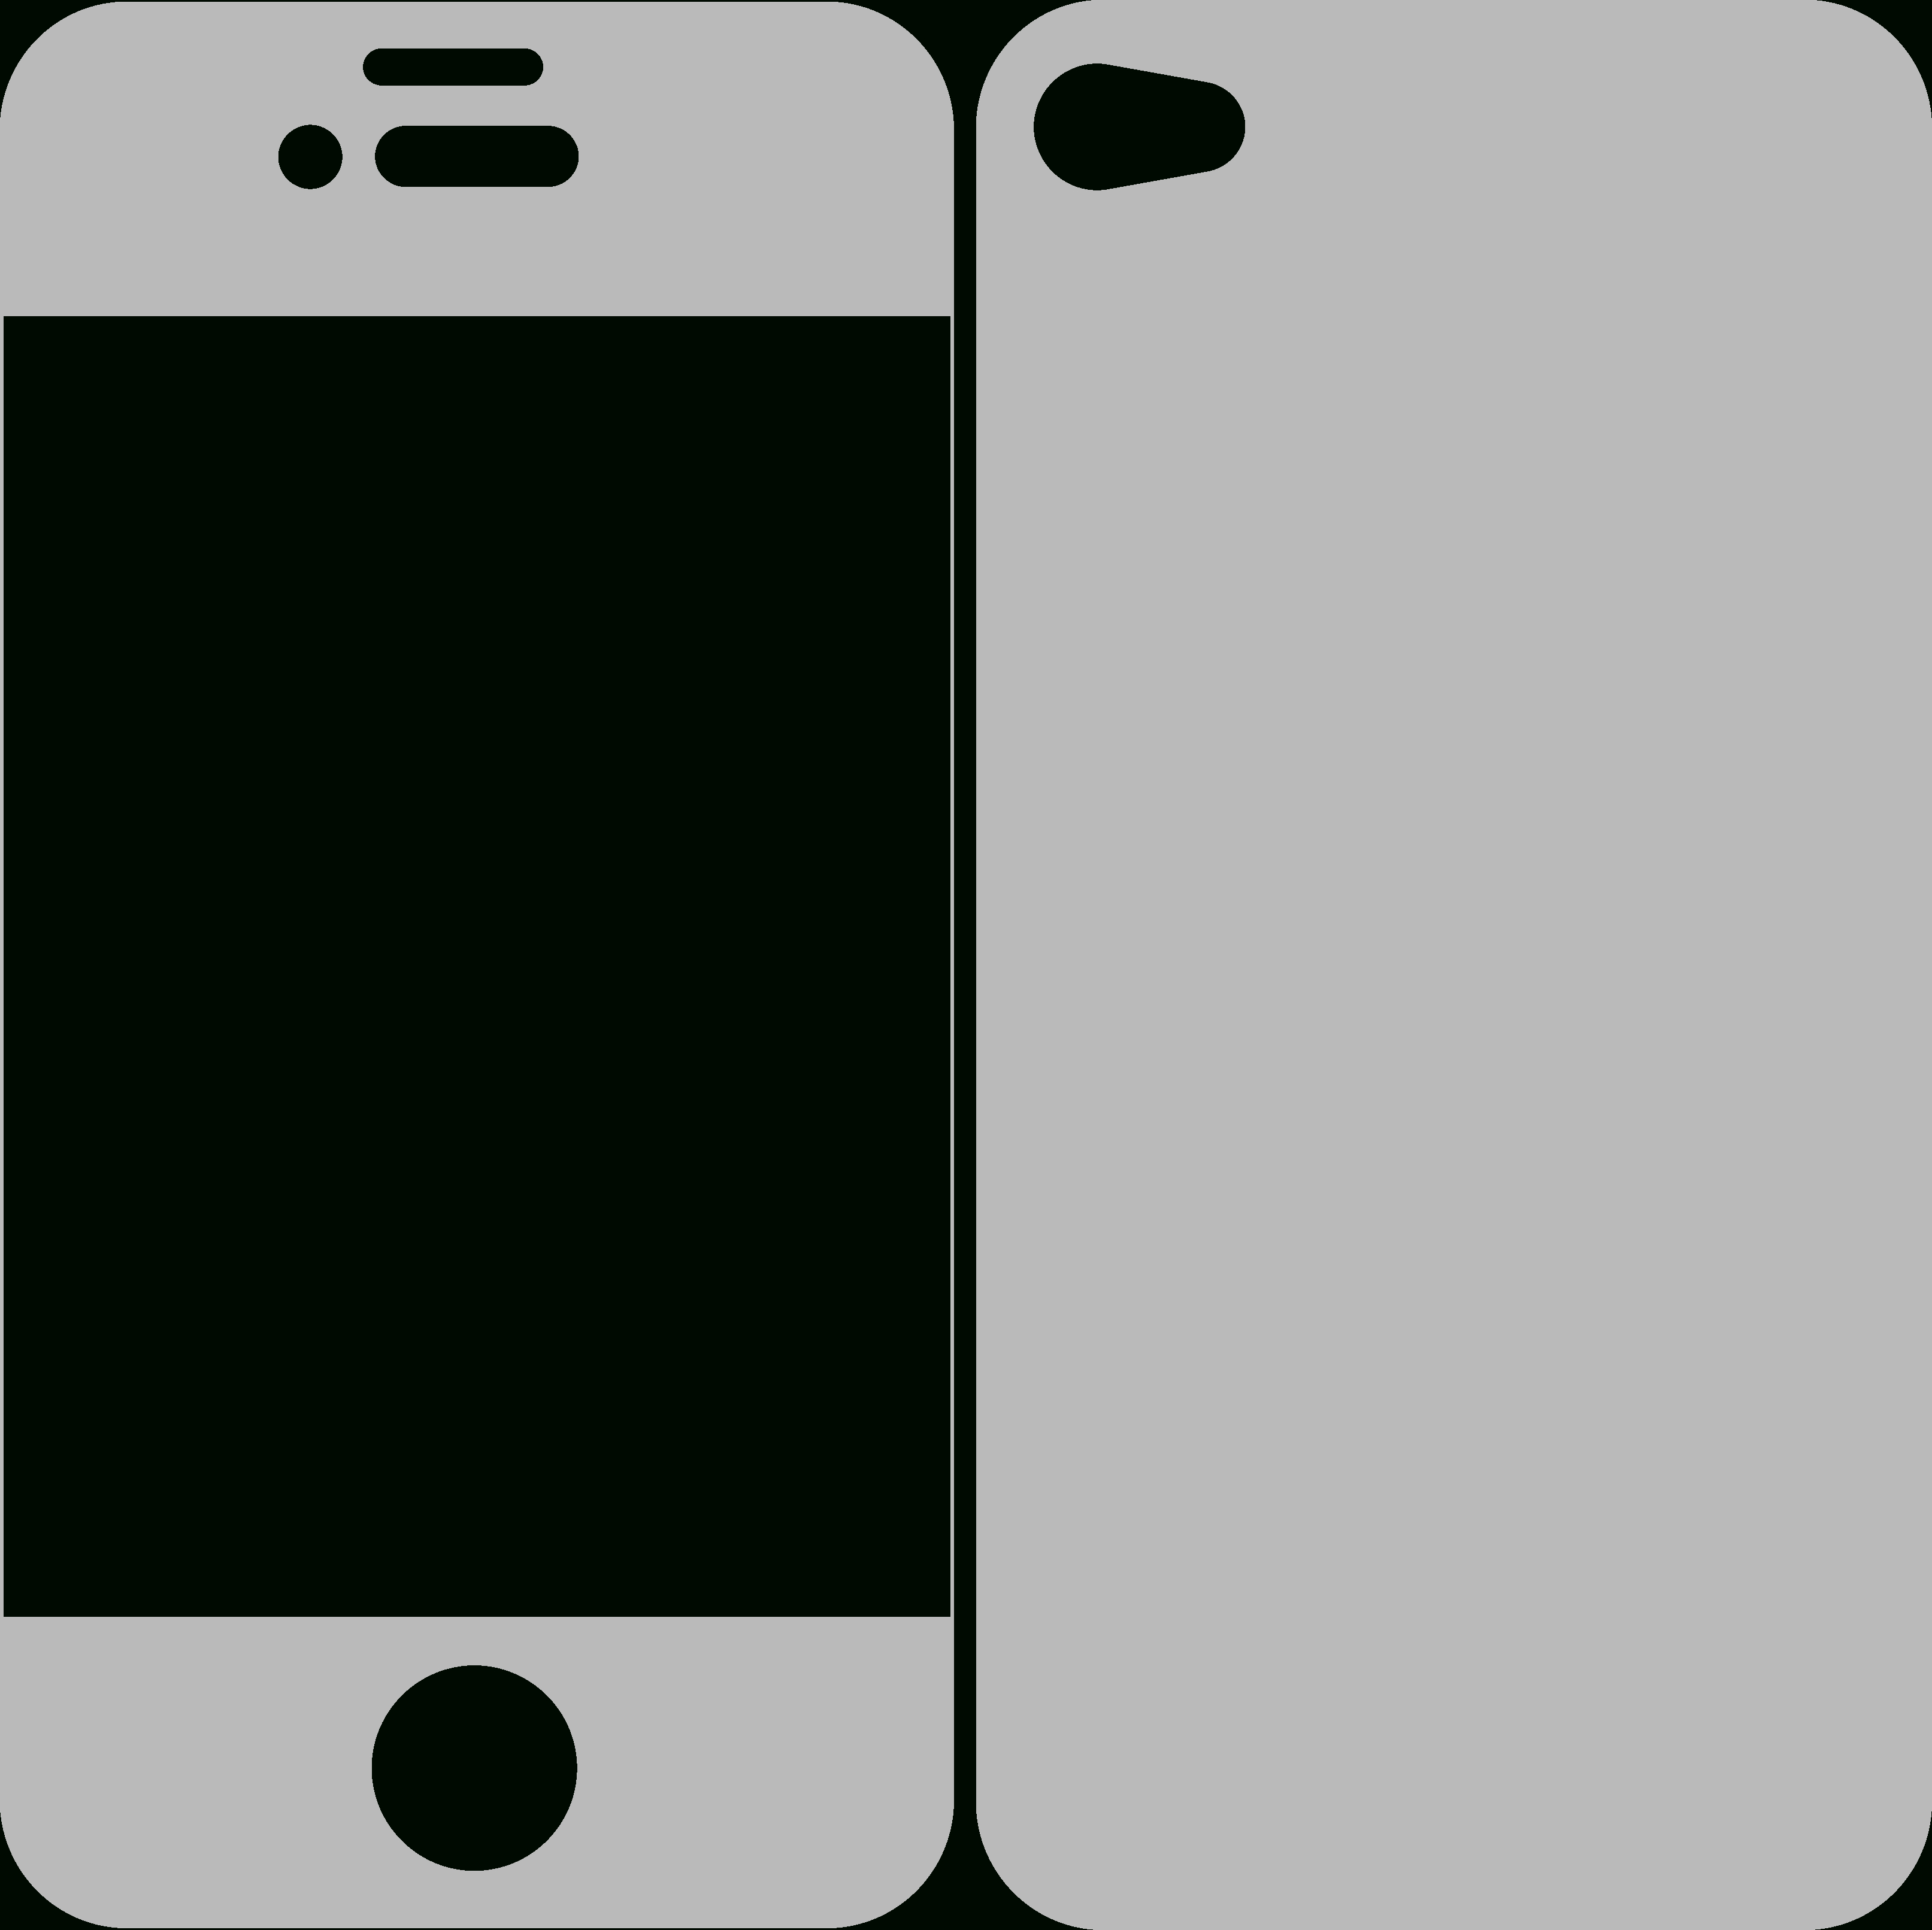 Free Iphone 6 Skin Template - Free Printable Iphone Skins